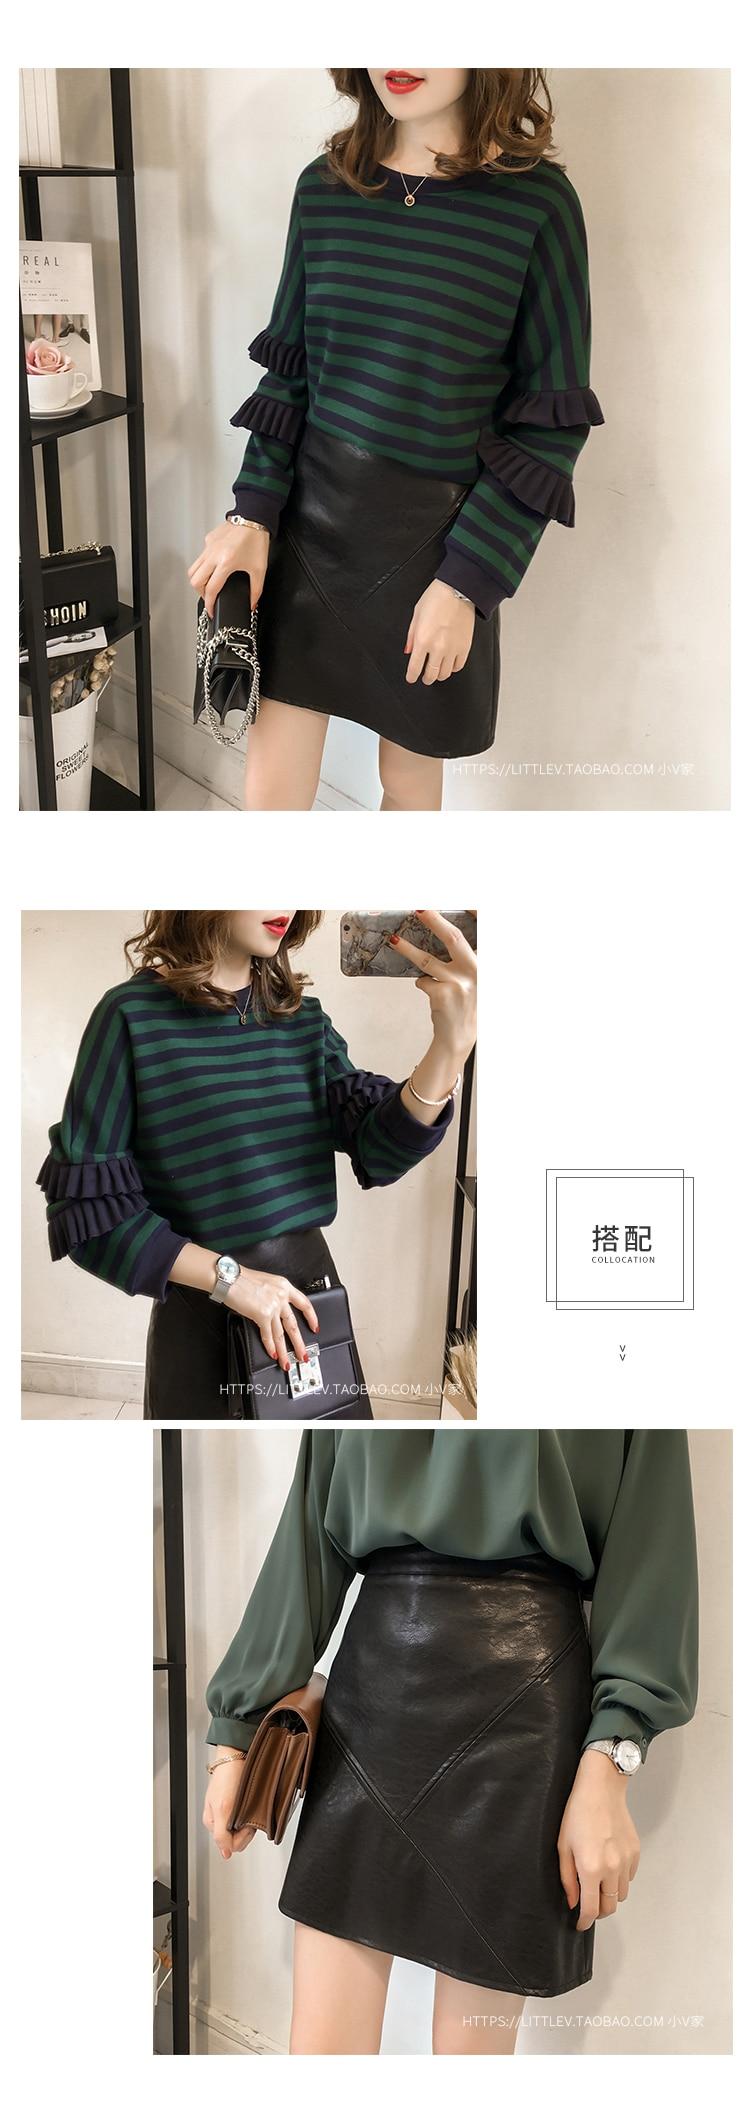 M-4xl Striped Sweatshirt Pullovers Women Plus Size Spring Autumn Ruffles Long Sleeve Tops Casual Harajuku Feminino White Green 16